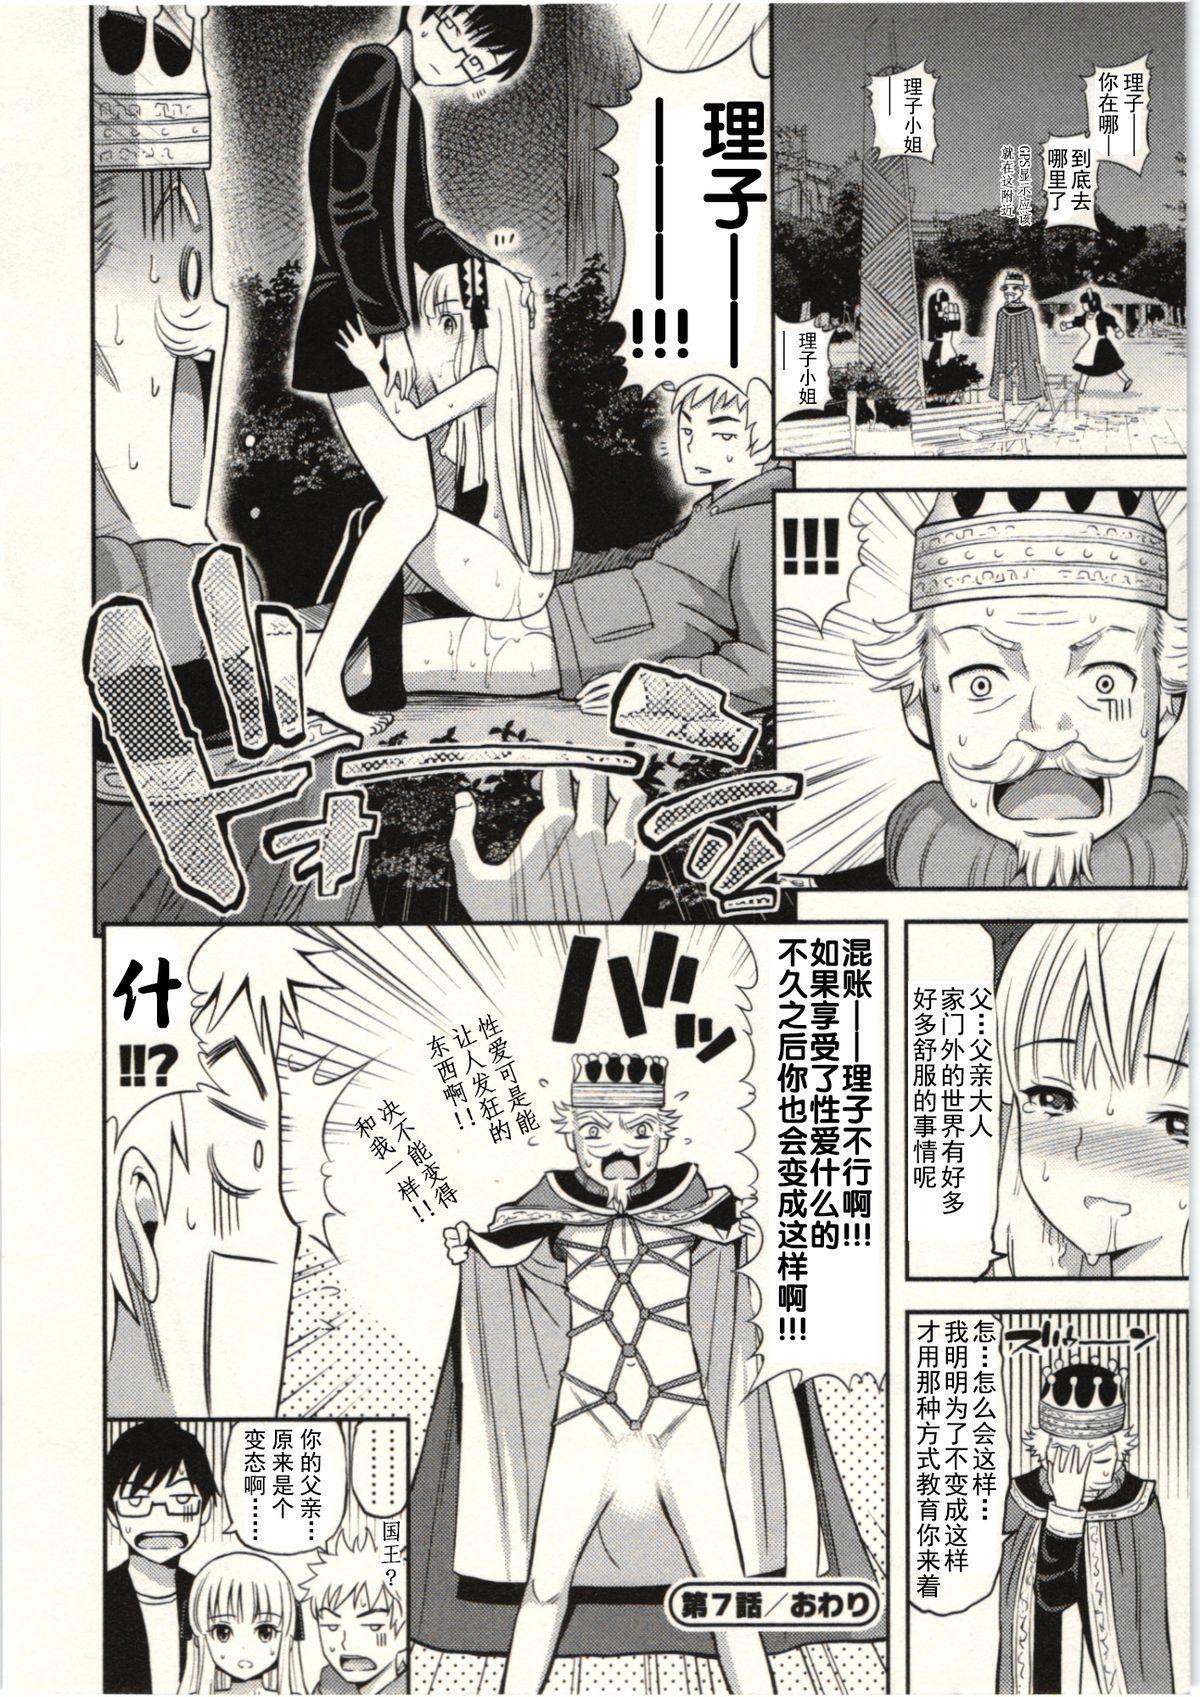 Tadashii Majutsu no Asobikata - The right way of playing of magic. 142